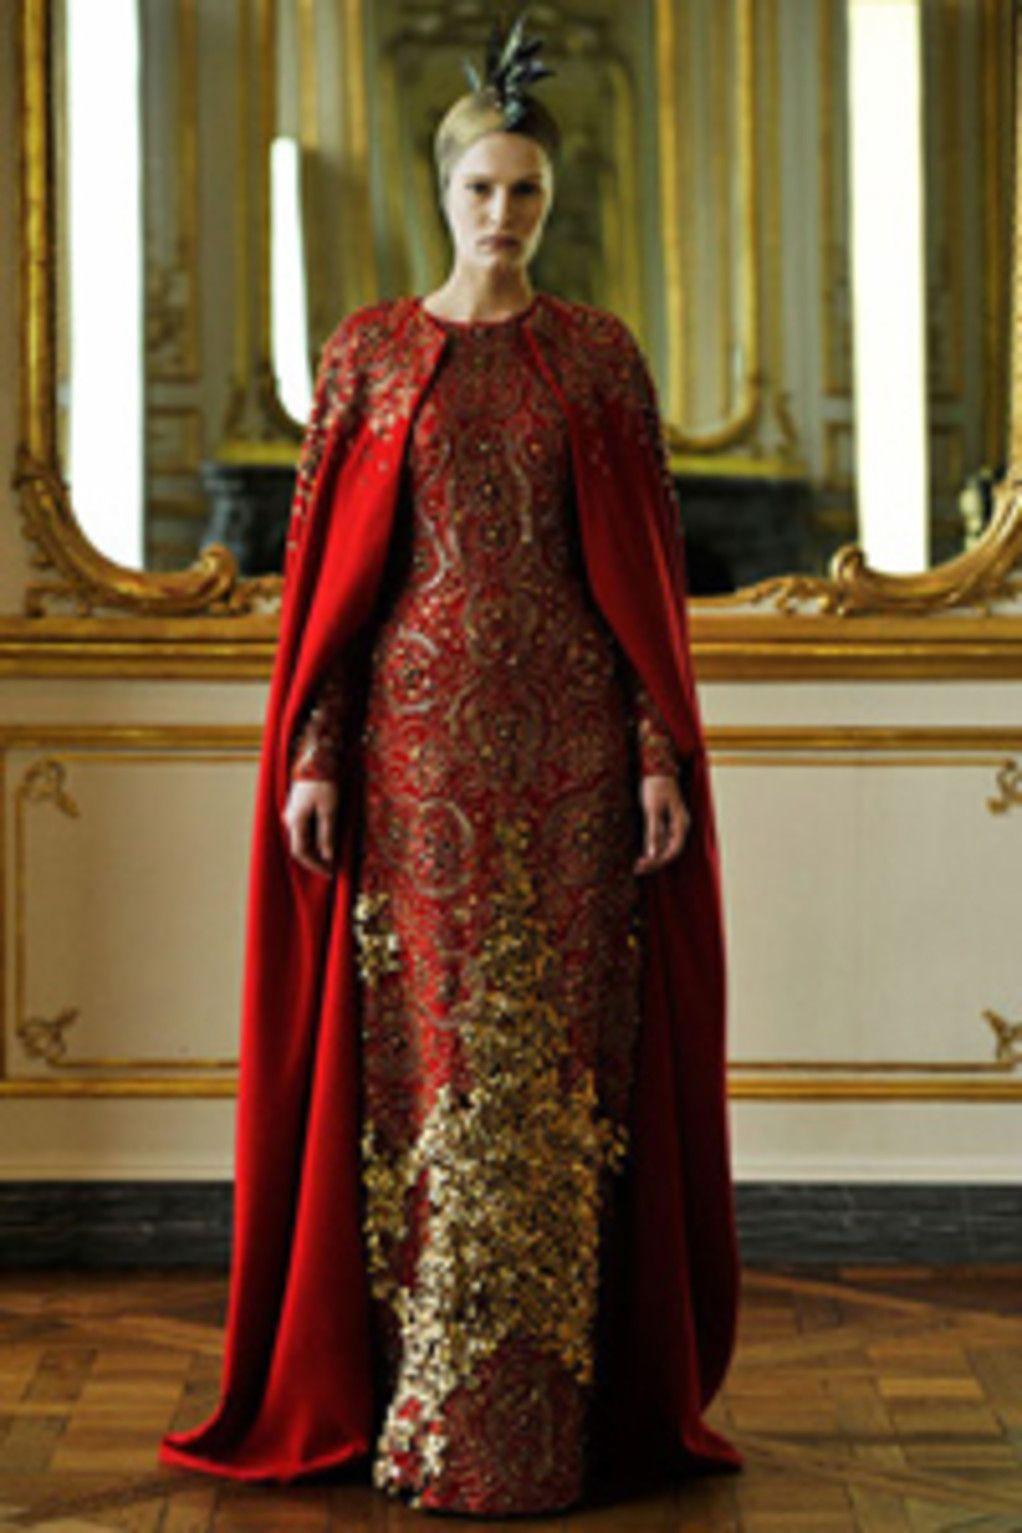 Alexander McQueen's Final Fashion Show | College Fashion